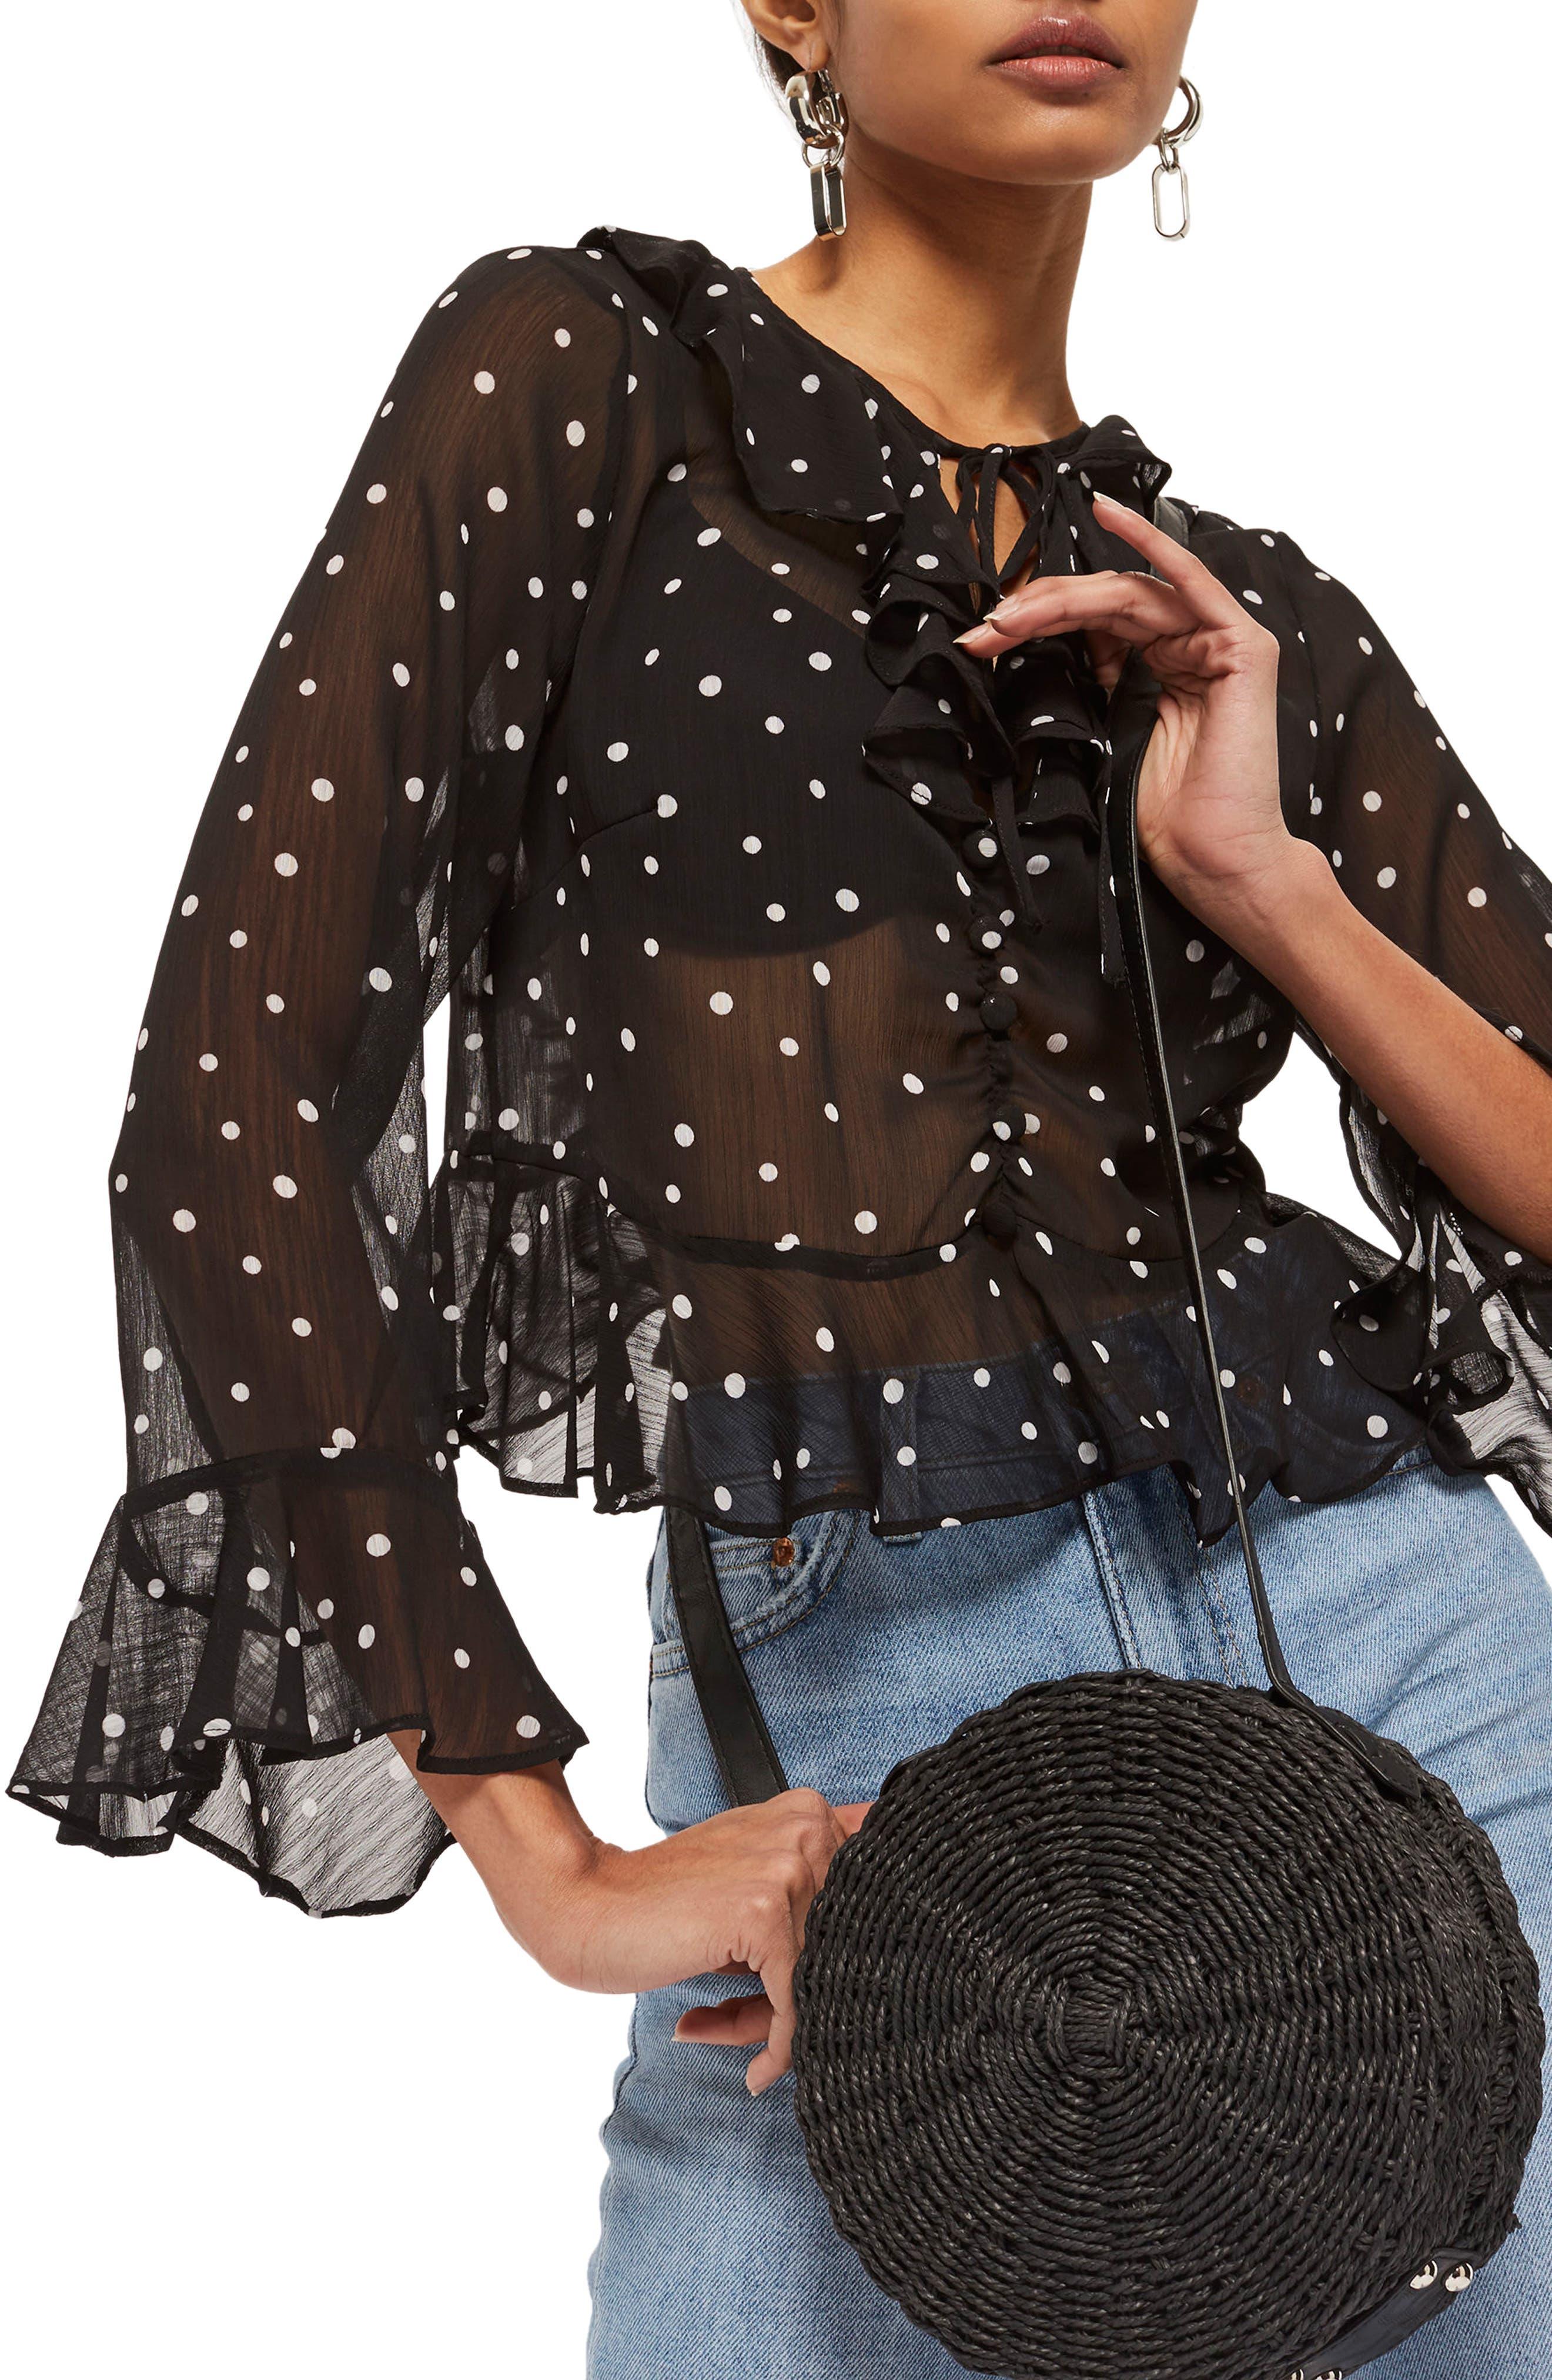 Roxy Dot Ruffle Blouse,                         Main,                         color, Black Multi